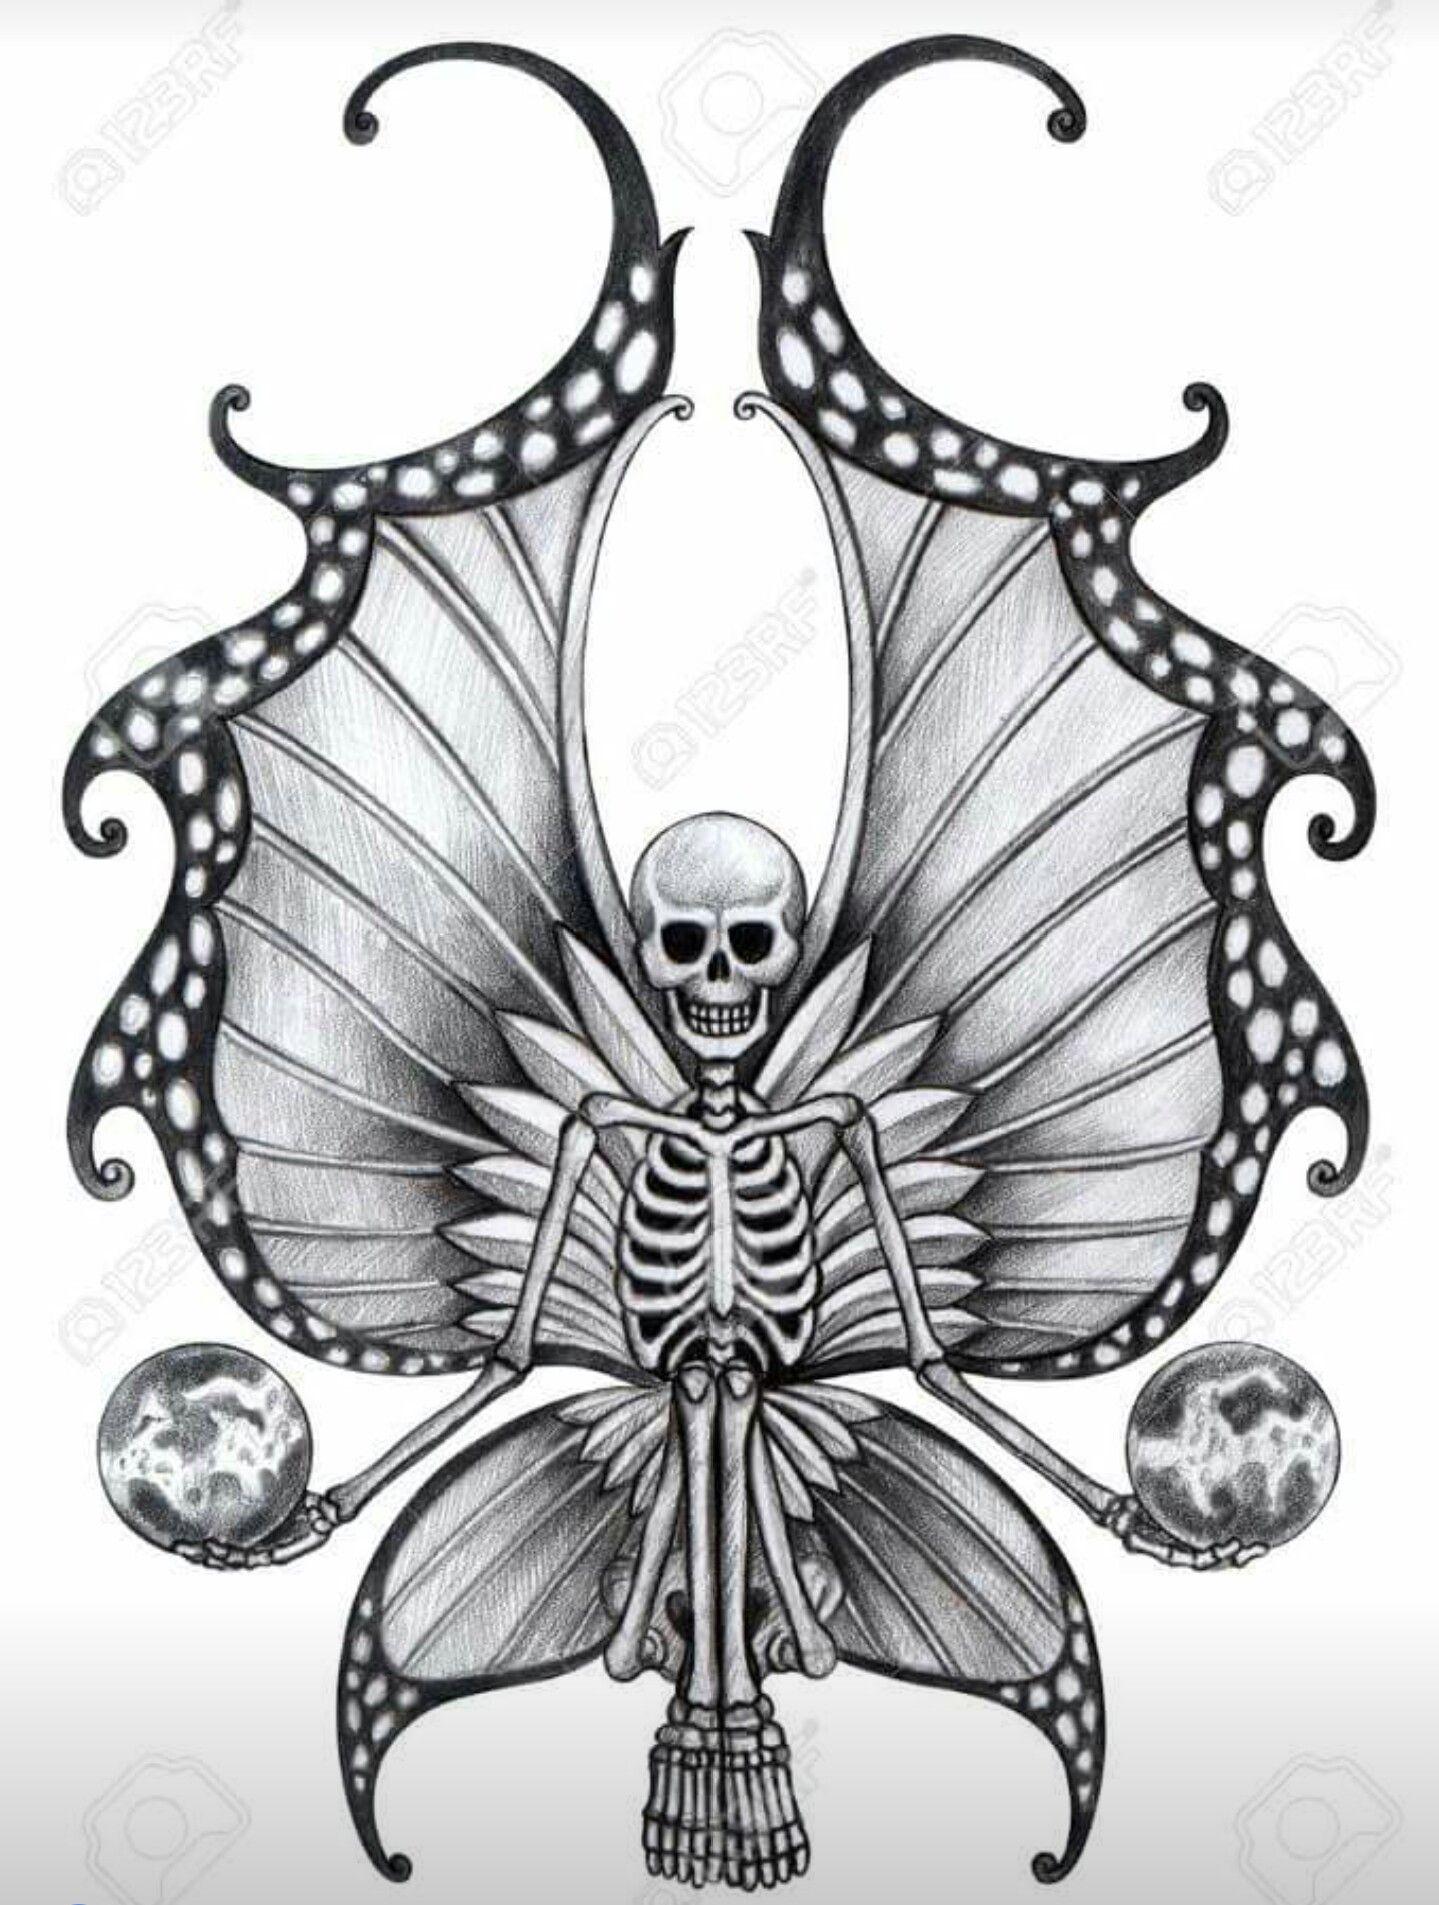 Pin By Tammy Williams Bartelt On Skulls Fairy Tattoo Skulls Drawing Skull Pictures